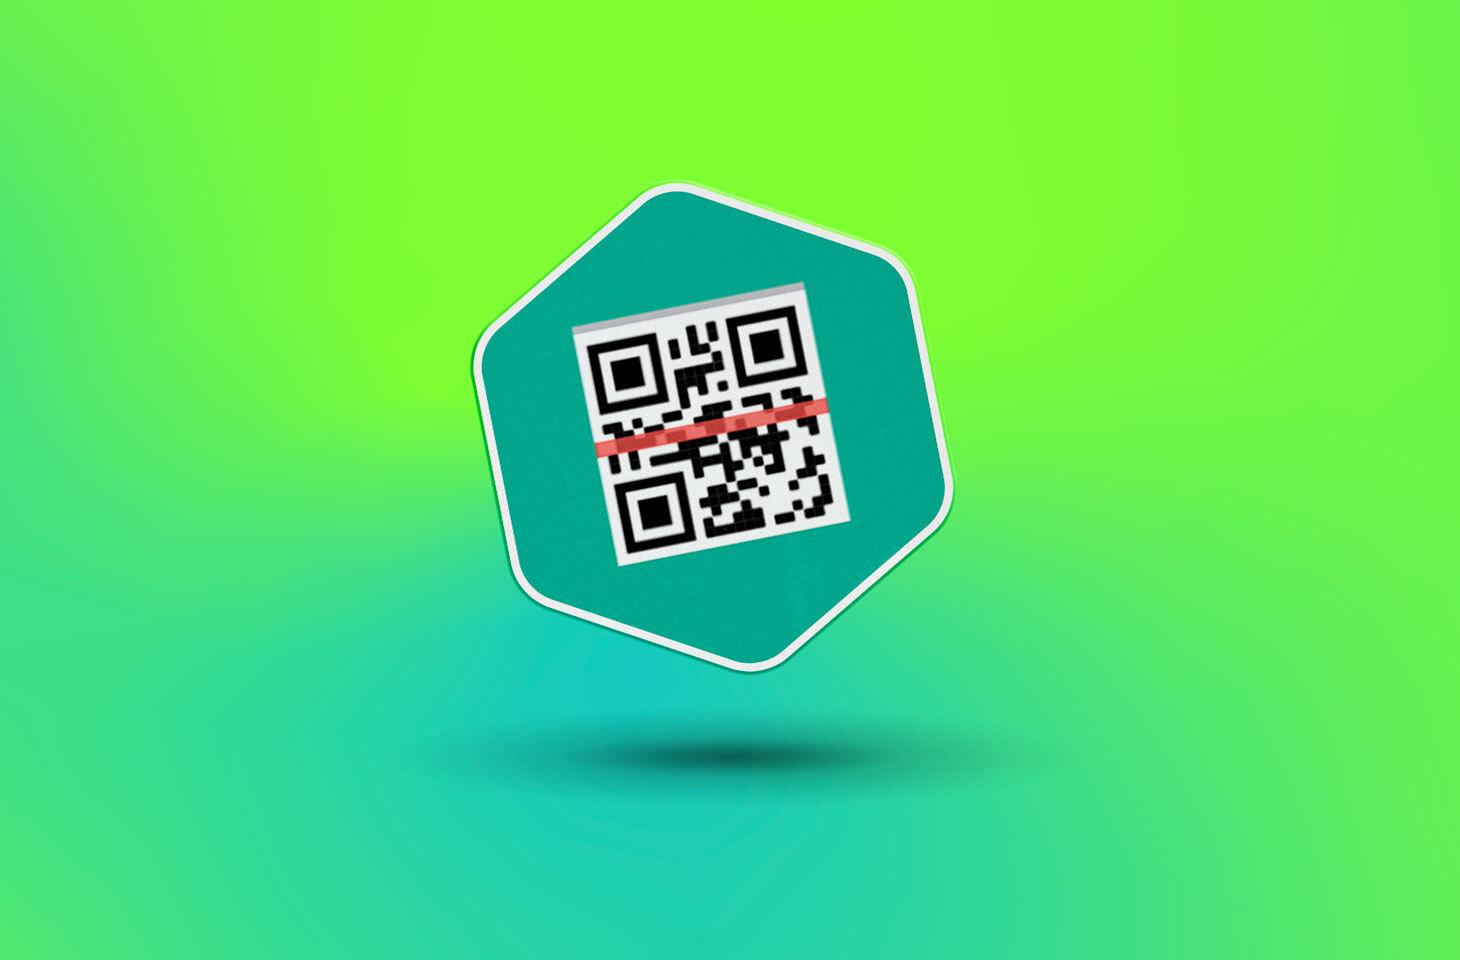 Fraude con códigos QR | Blog oficial de Kaspersky